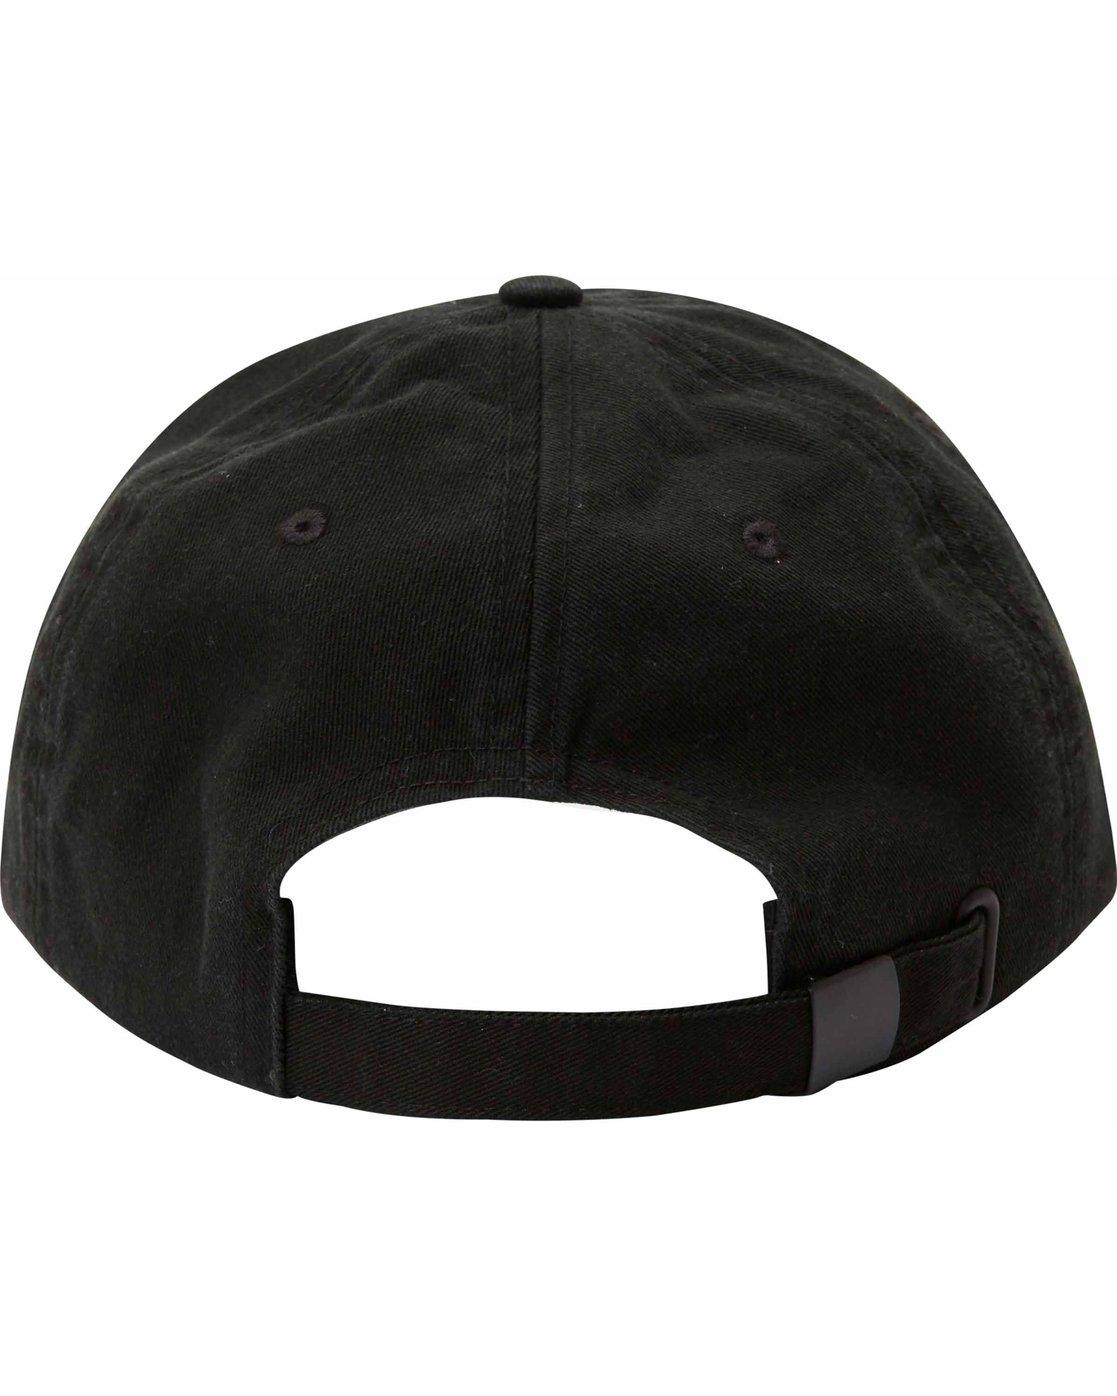 b62c9511ad9 3 All Day Lad Hat Black MAHTMADL Billabong